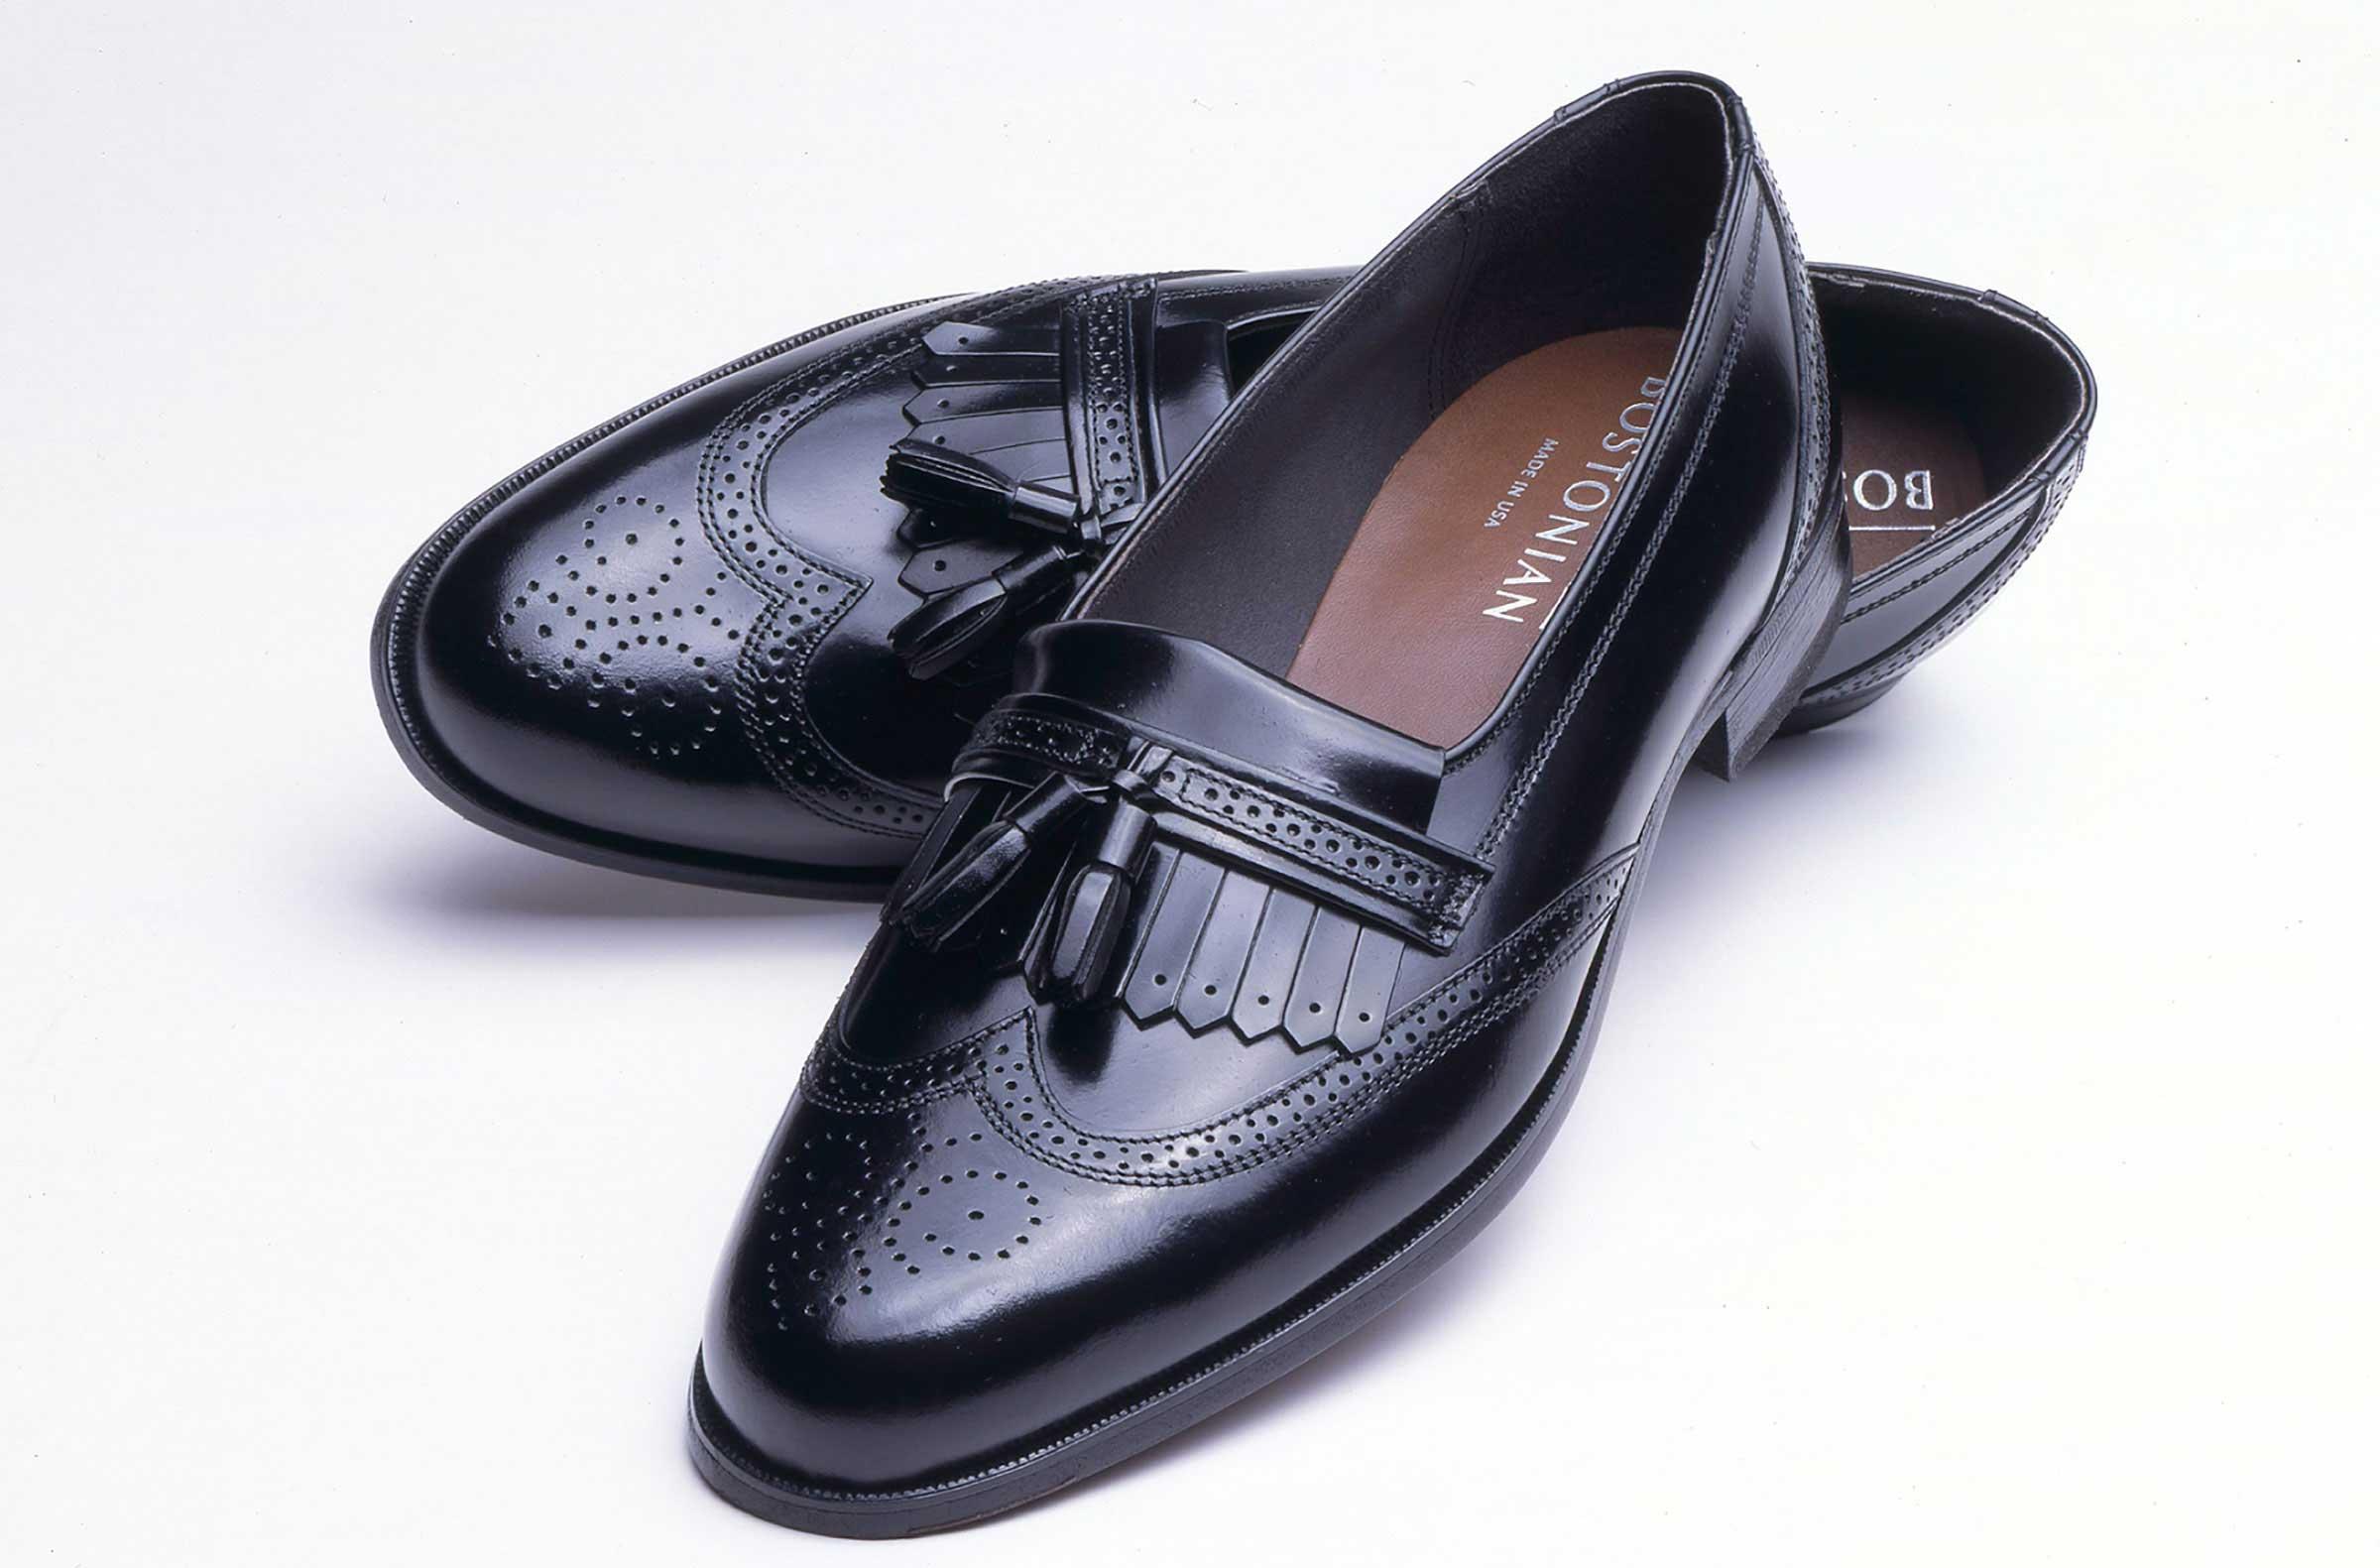 bostonian-black-tassle-loafers.jpg